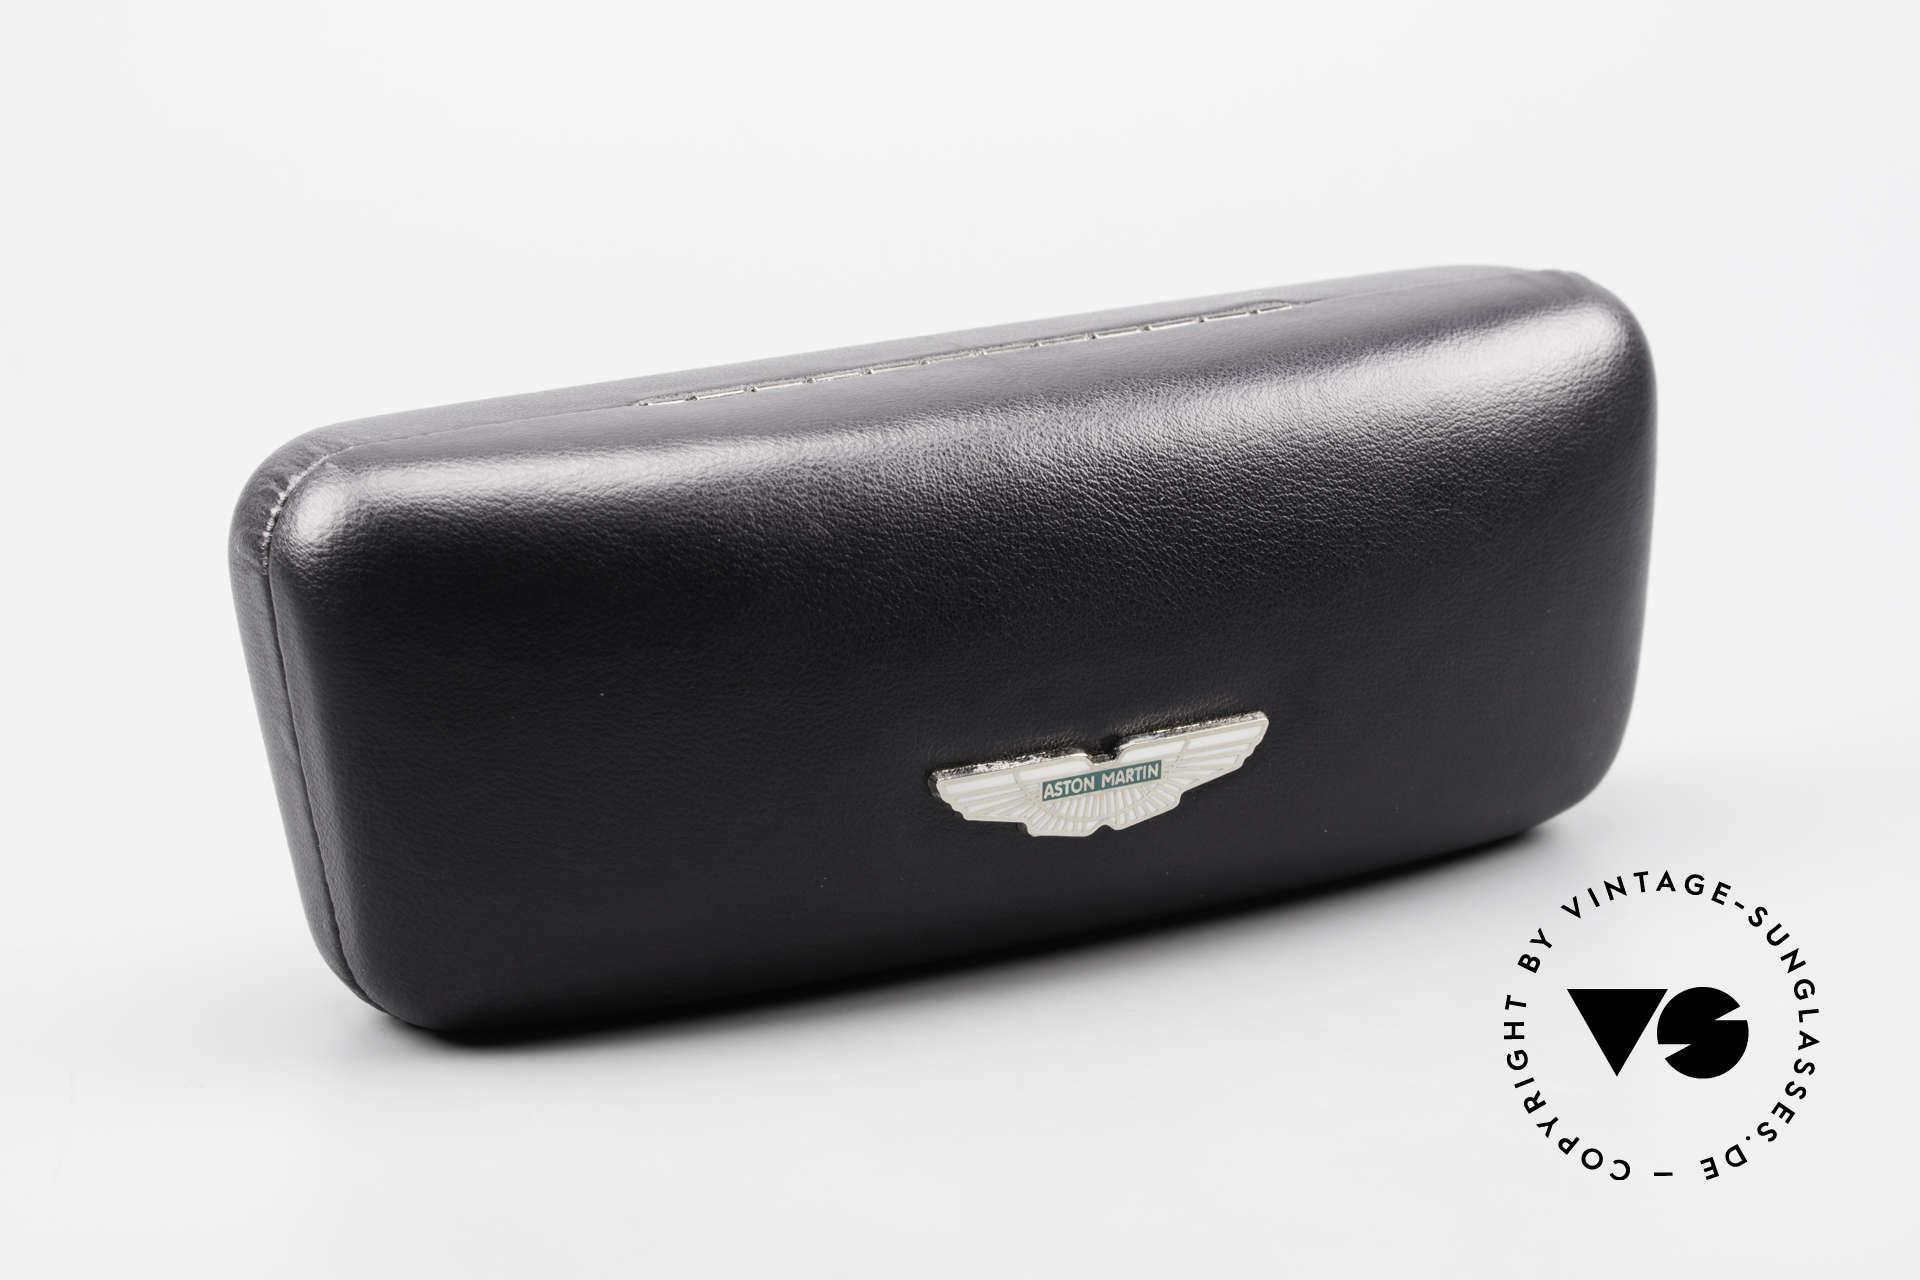 Aston Martin AM49 Titanium Glasses Aviator Style, Size: extra large, Made for Men